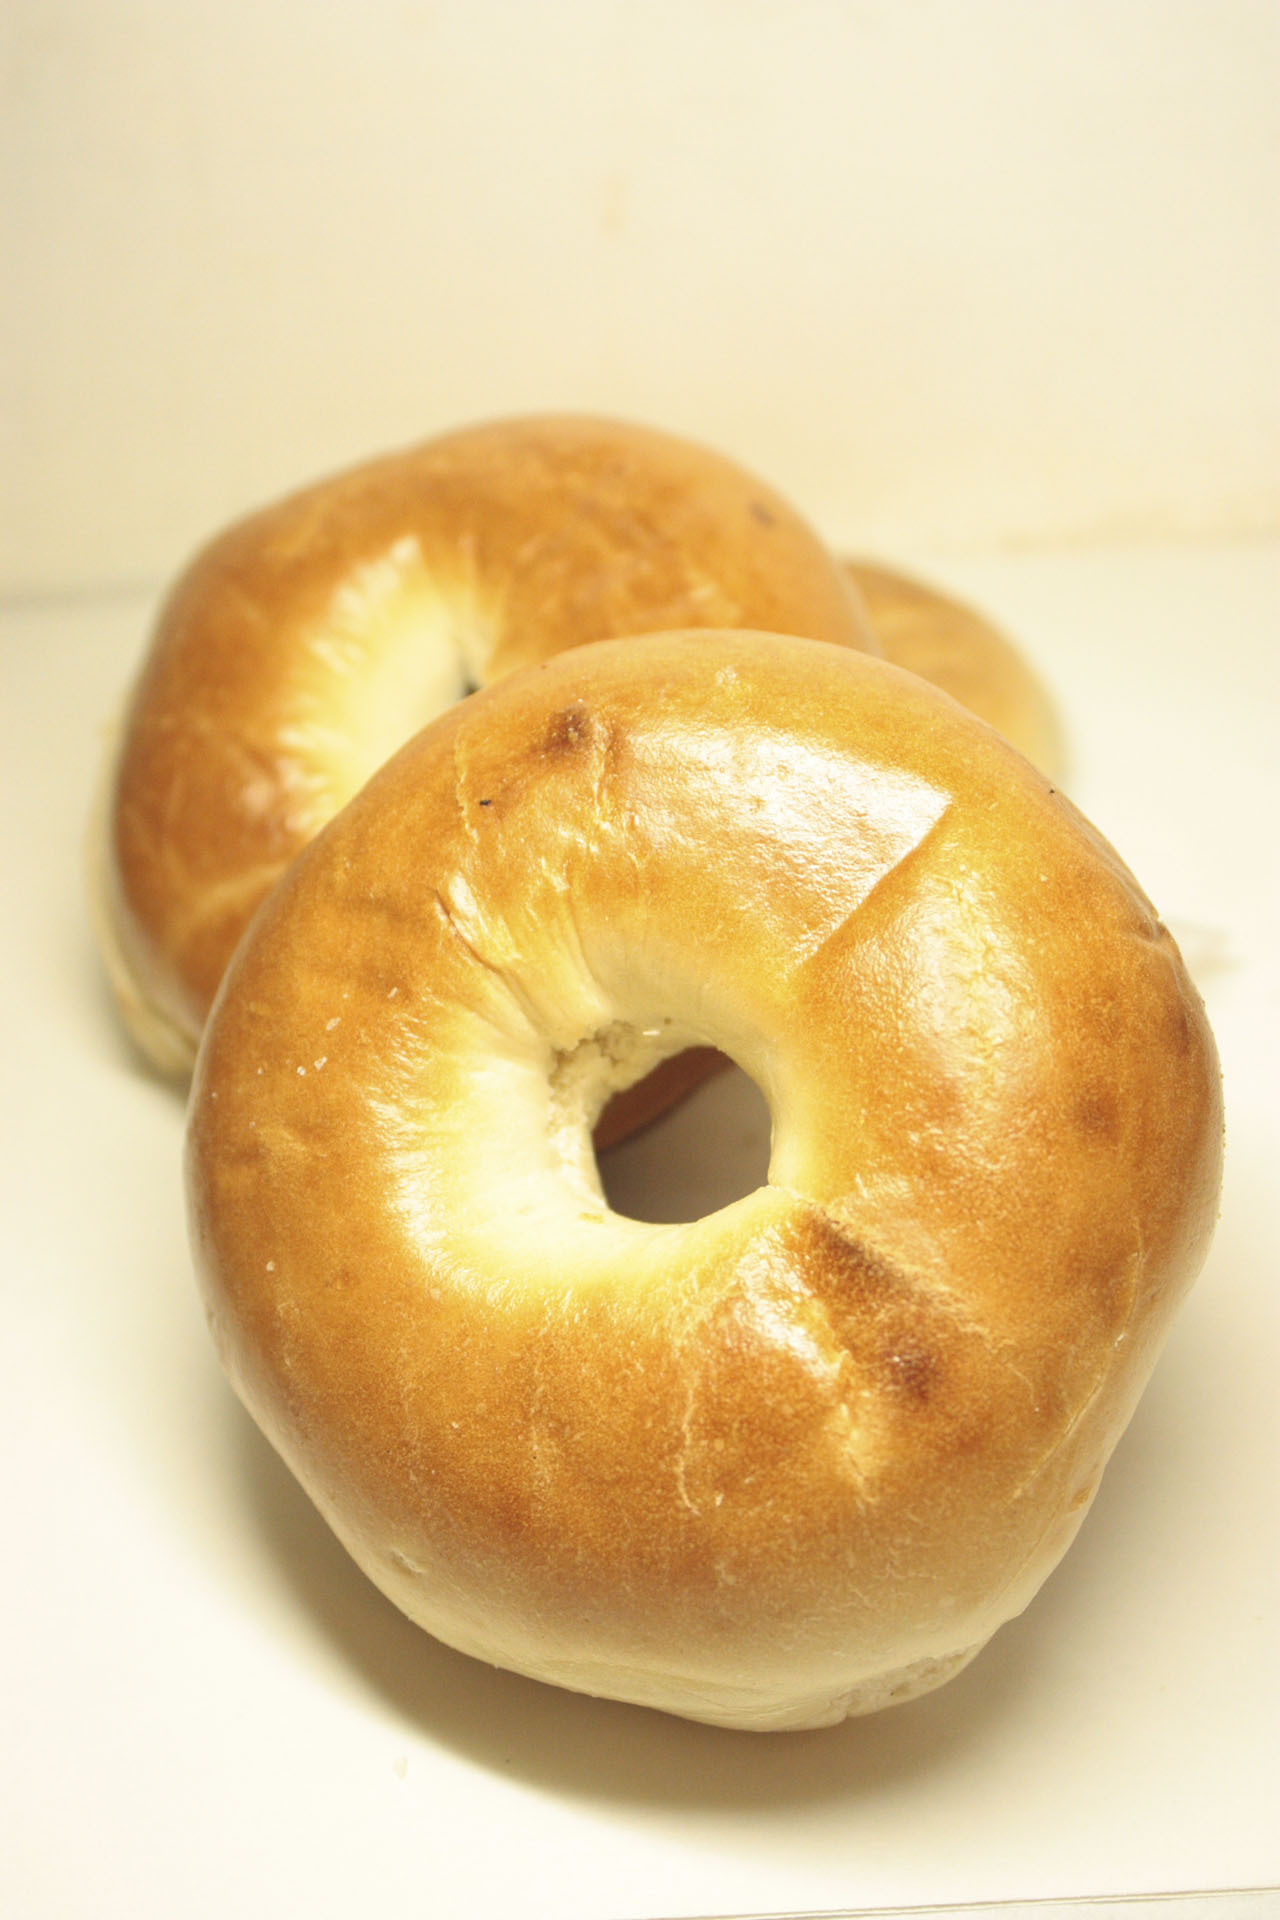 cheres-cousines-bagels-lyon-107.jpg